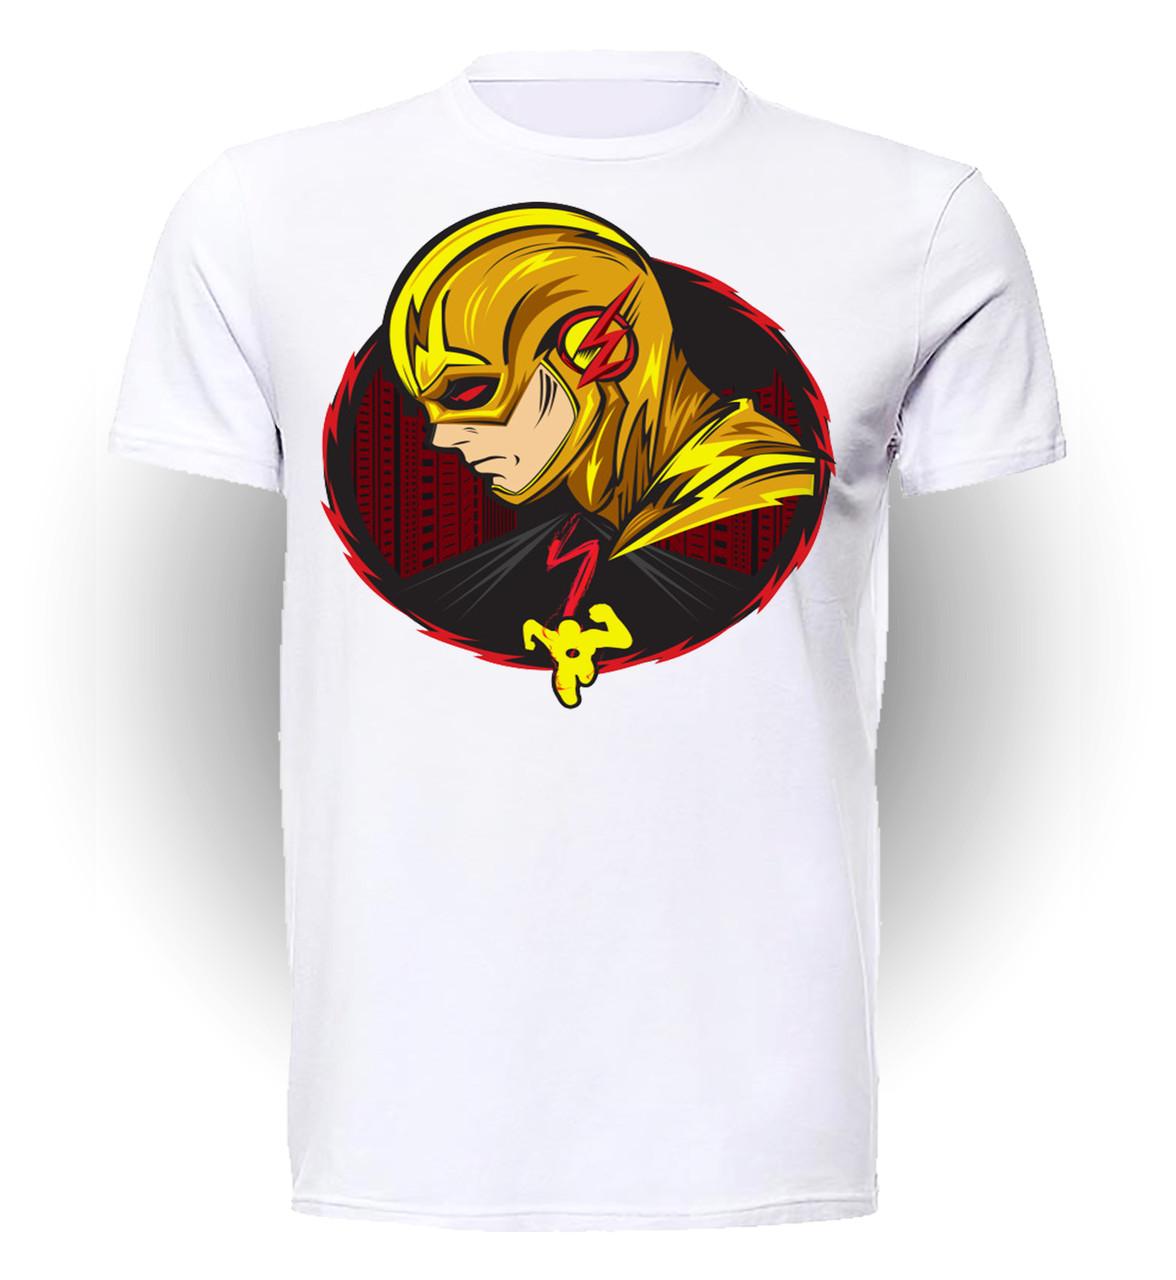 Футболка мужская GeekLand Флэш Flash желтый злодей FL.01.016